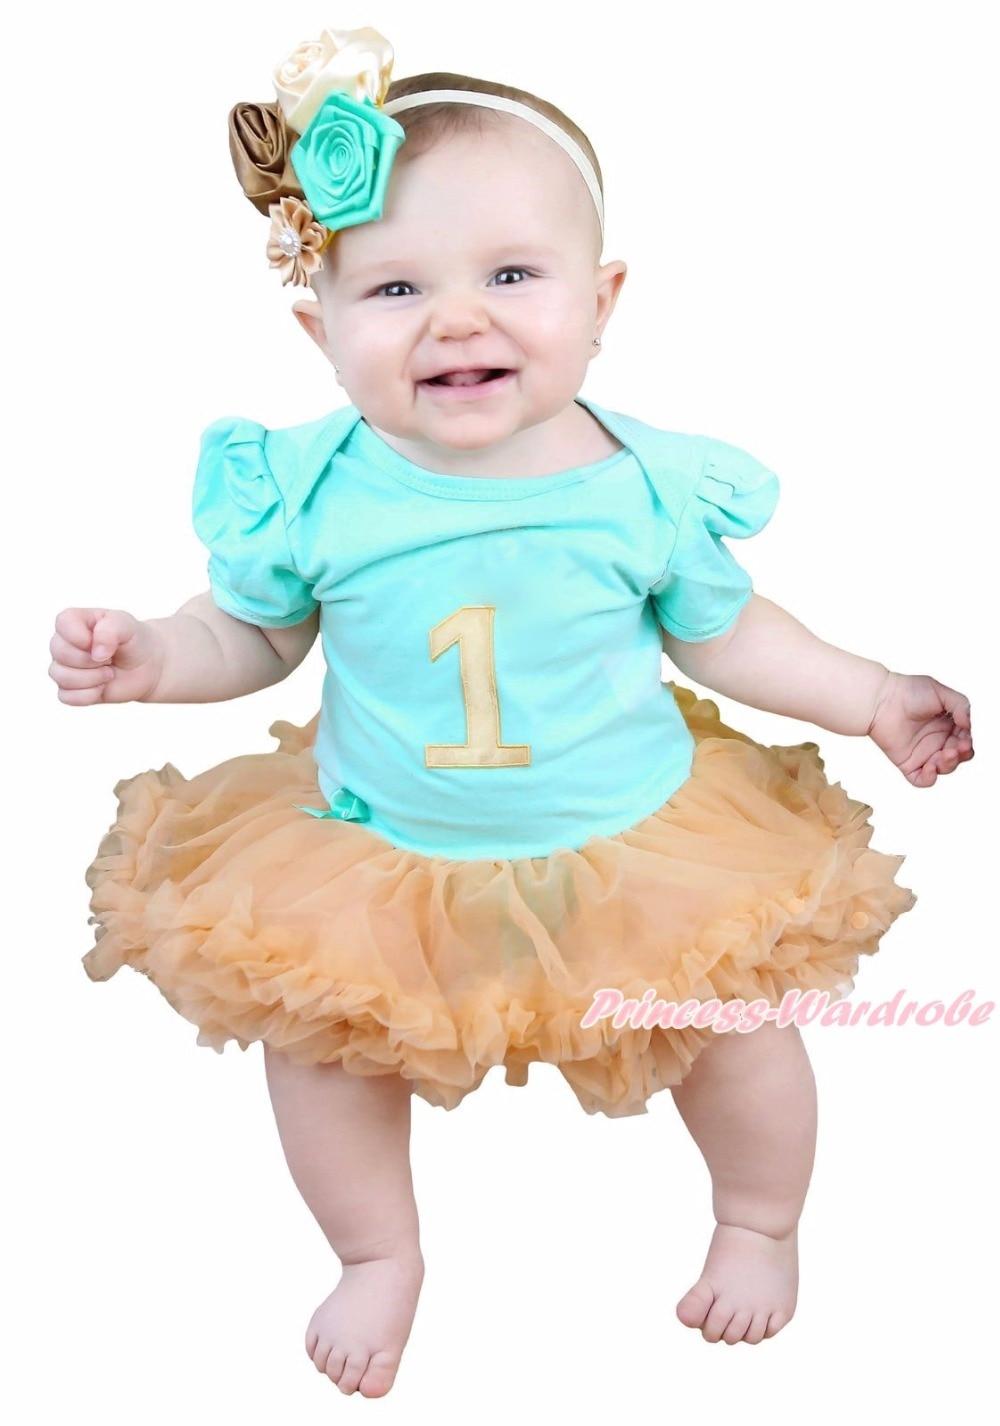 Fantastic Baby Wedding Outfit Gallery - Wedding Ideas - memiocall.com